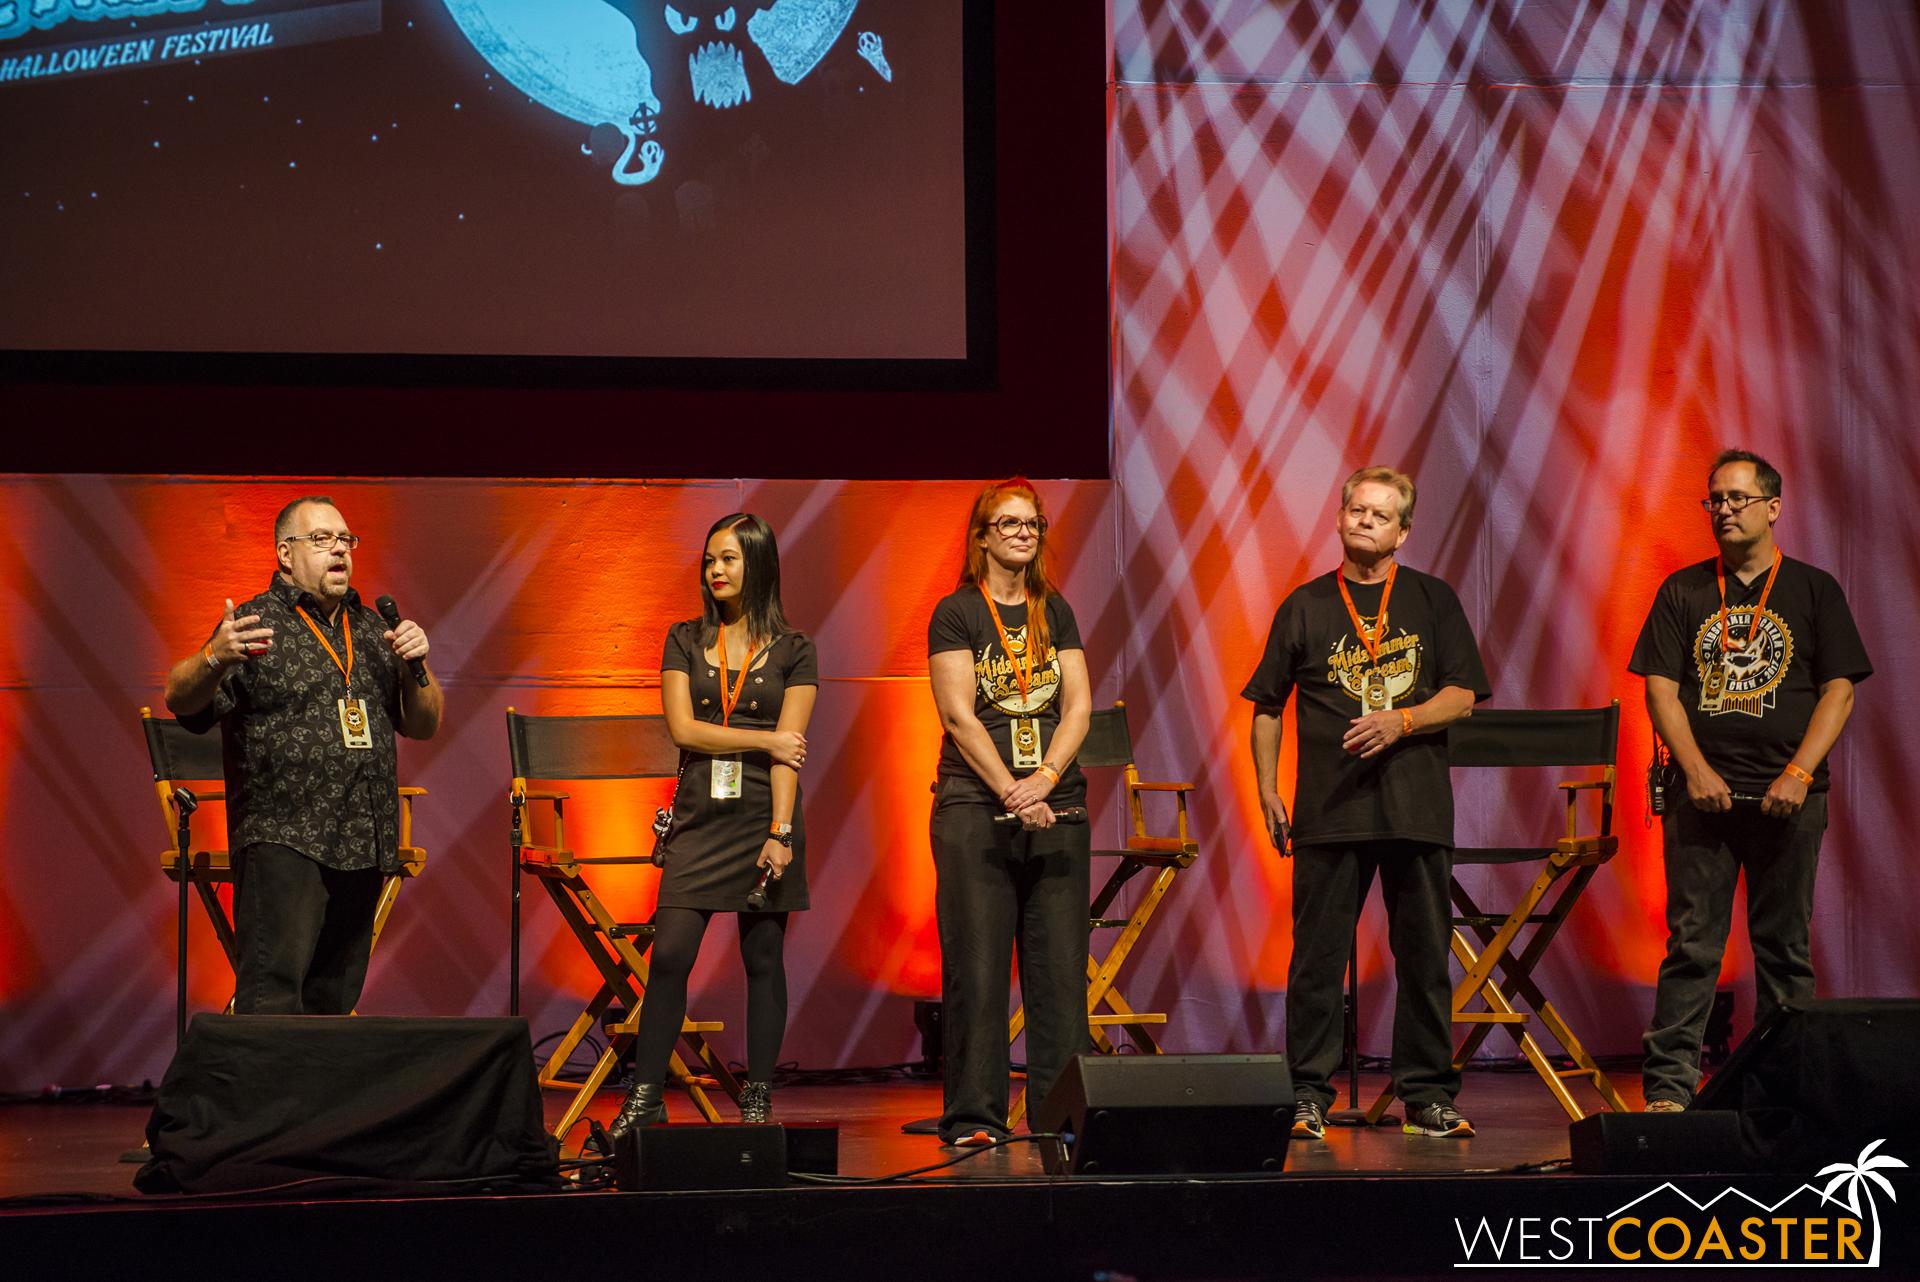 The 2017 Midsummer Scream creative team (L-R) Rick West, Johanna Atilano, Claire Dunlap, Gary Baker, and David Markland.